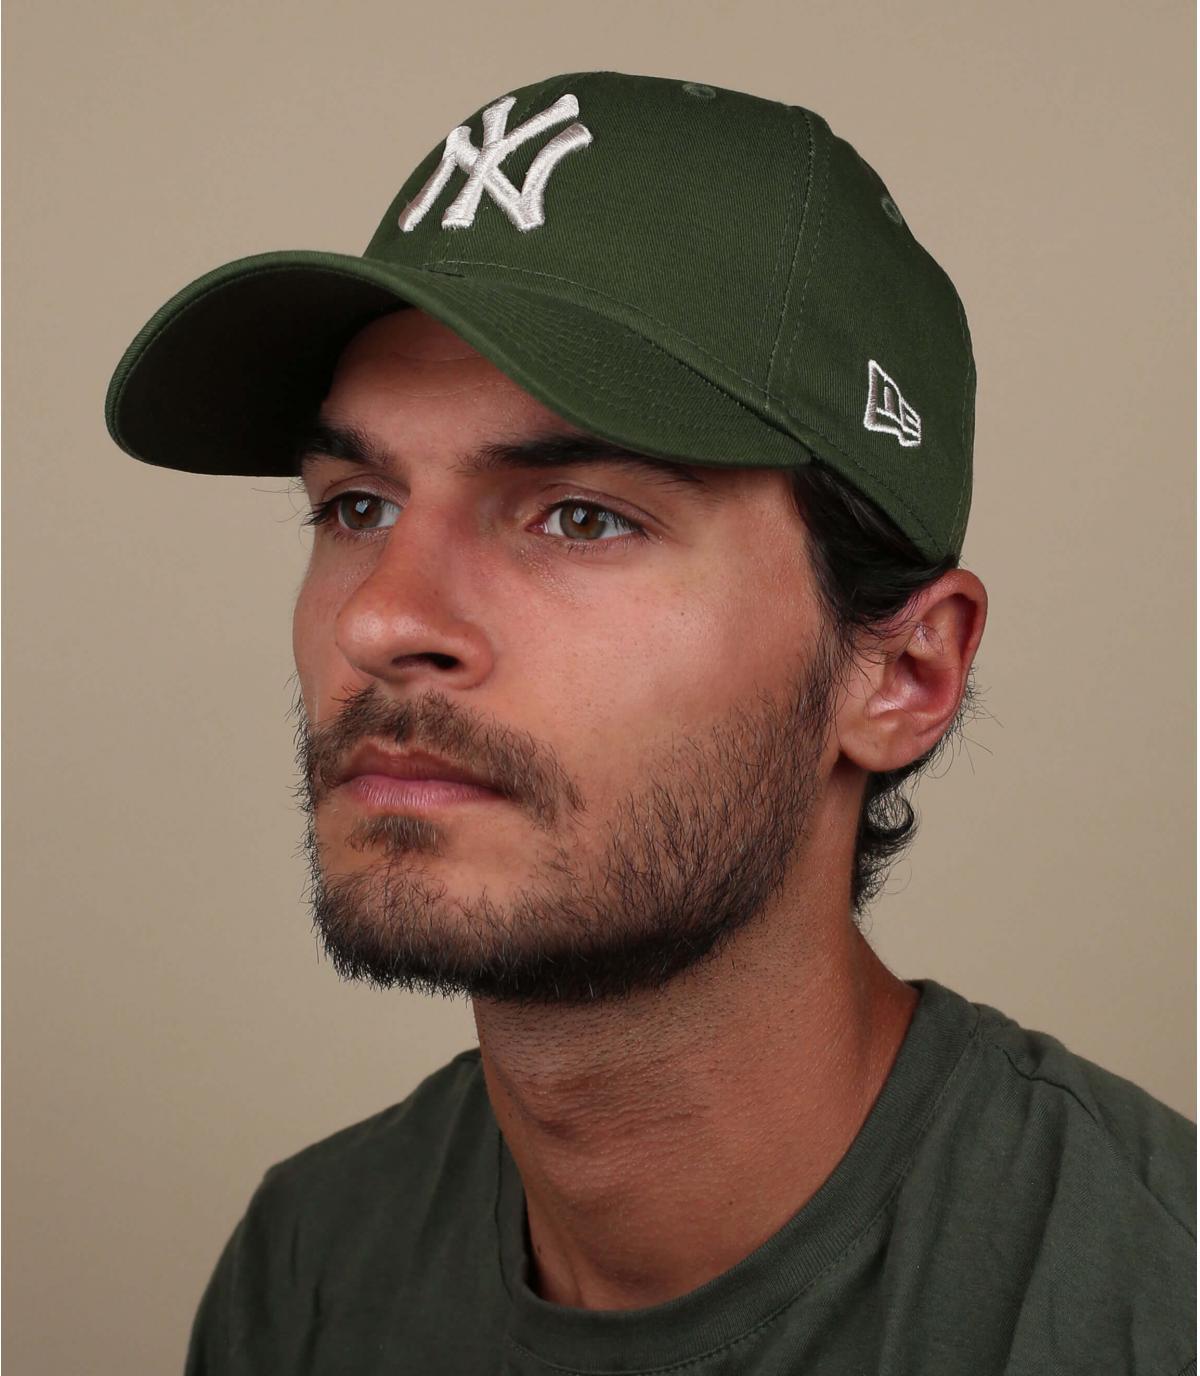 casquette NY vert gris